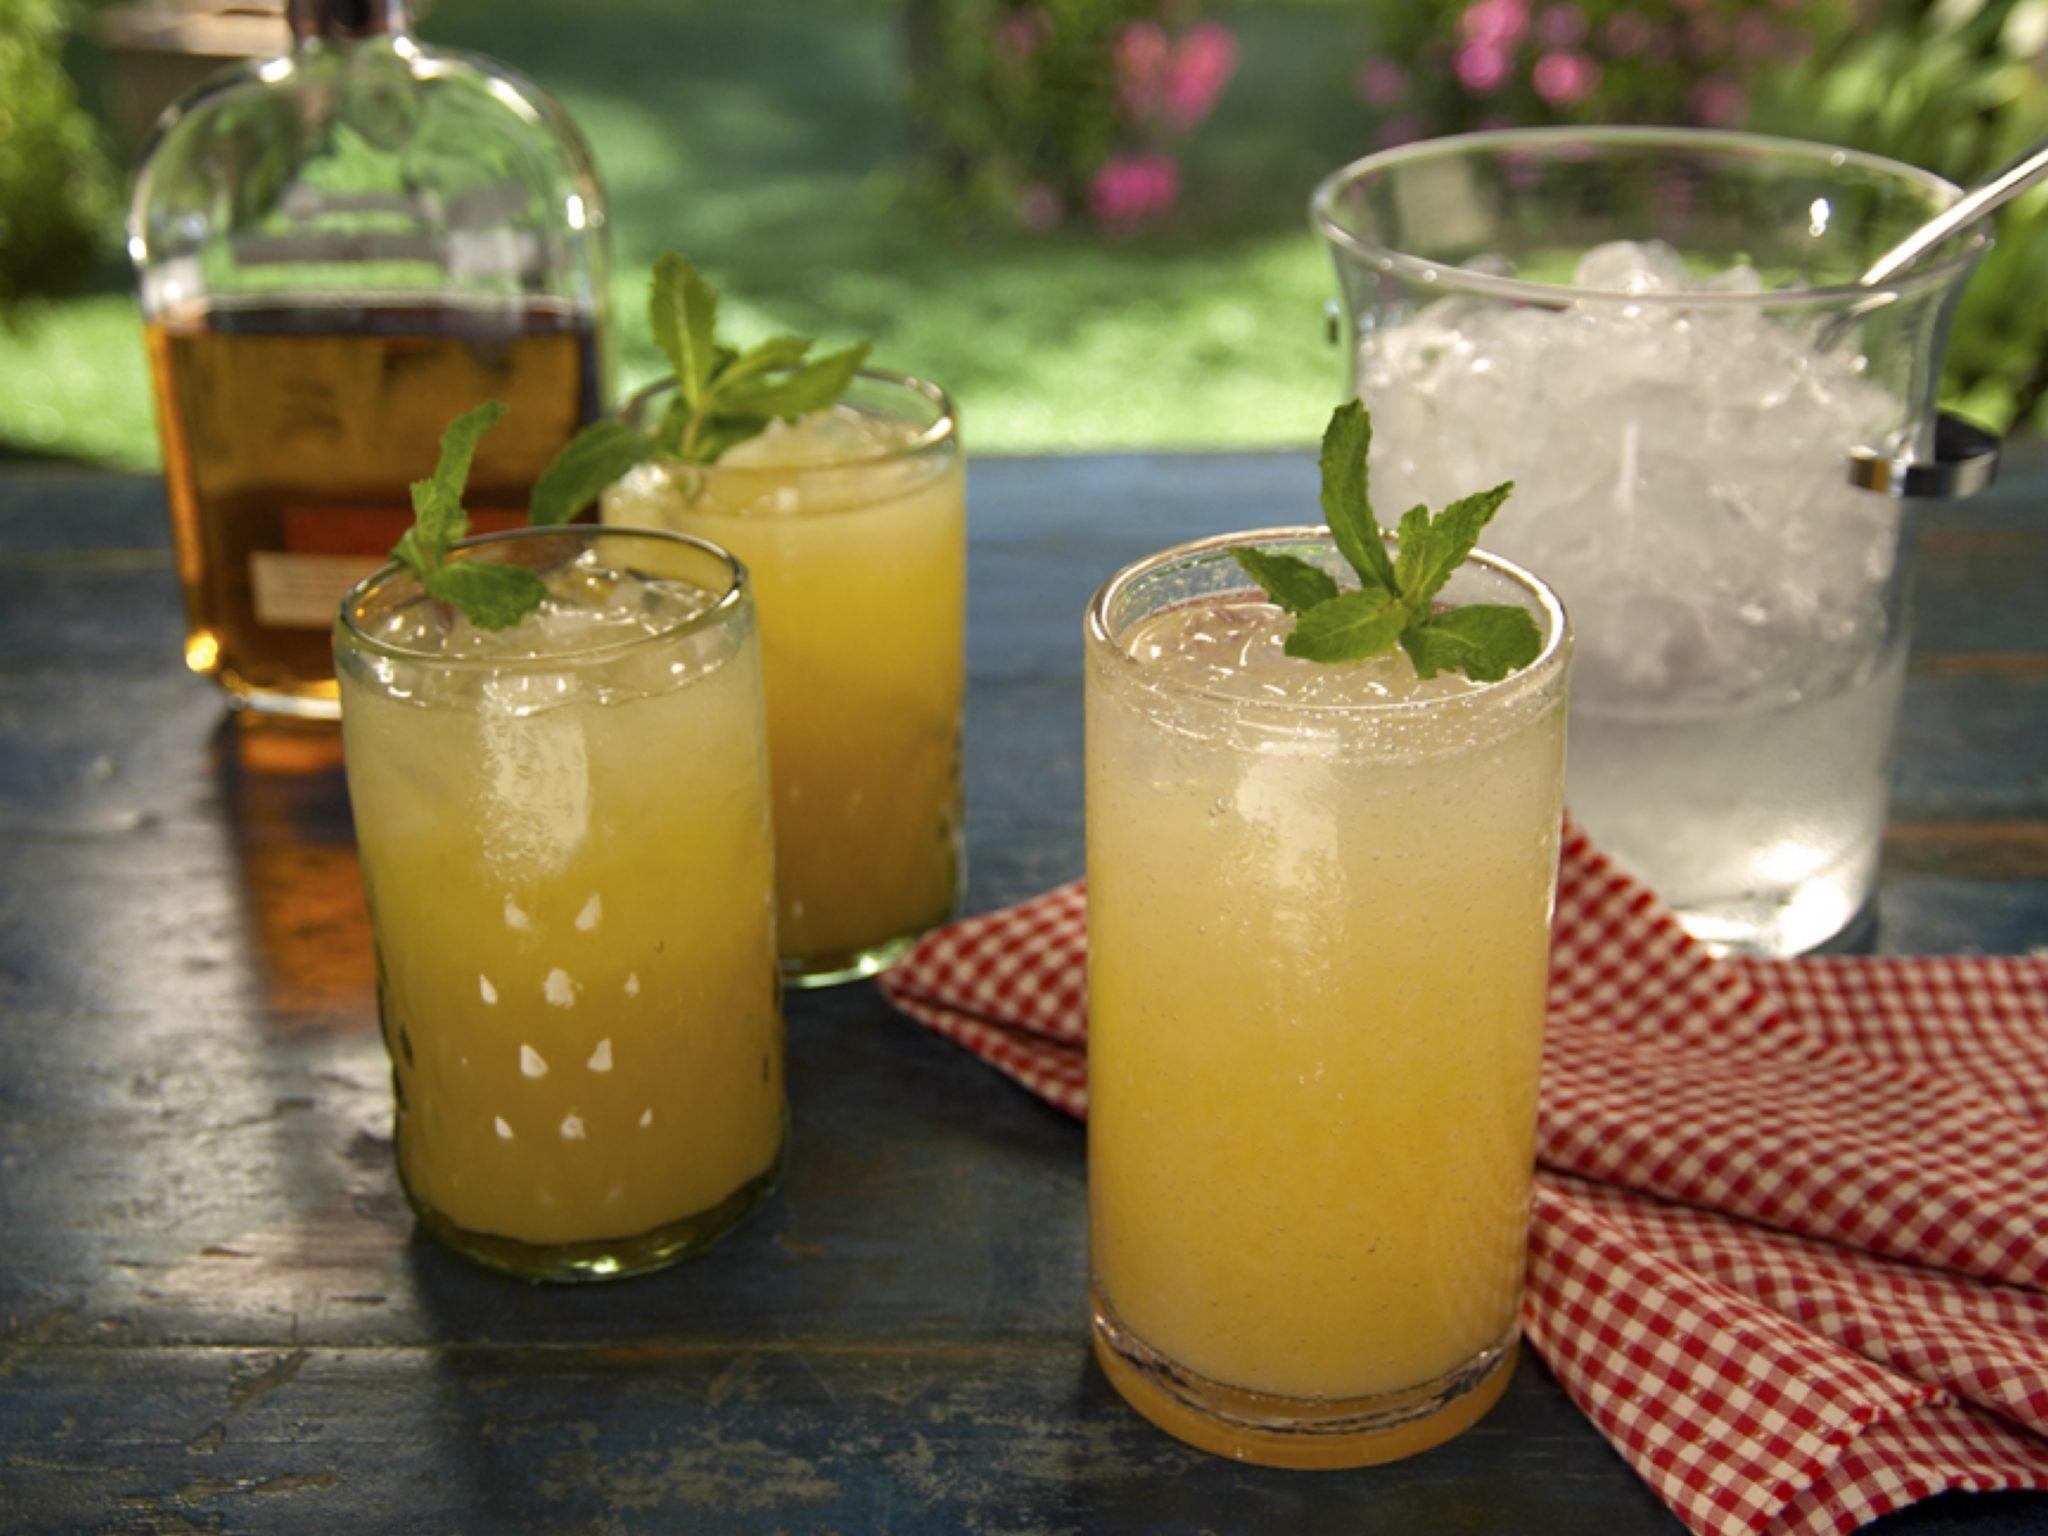 Limonada Espumante de Whisky Americano 0001_QF0211_49642_1027-press